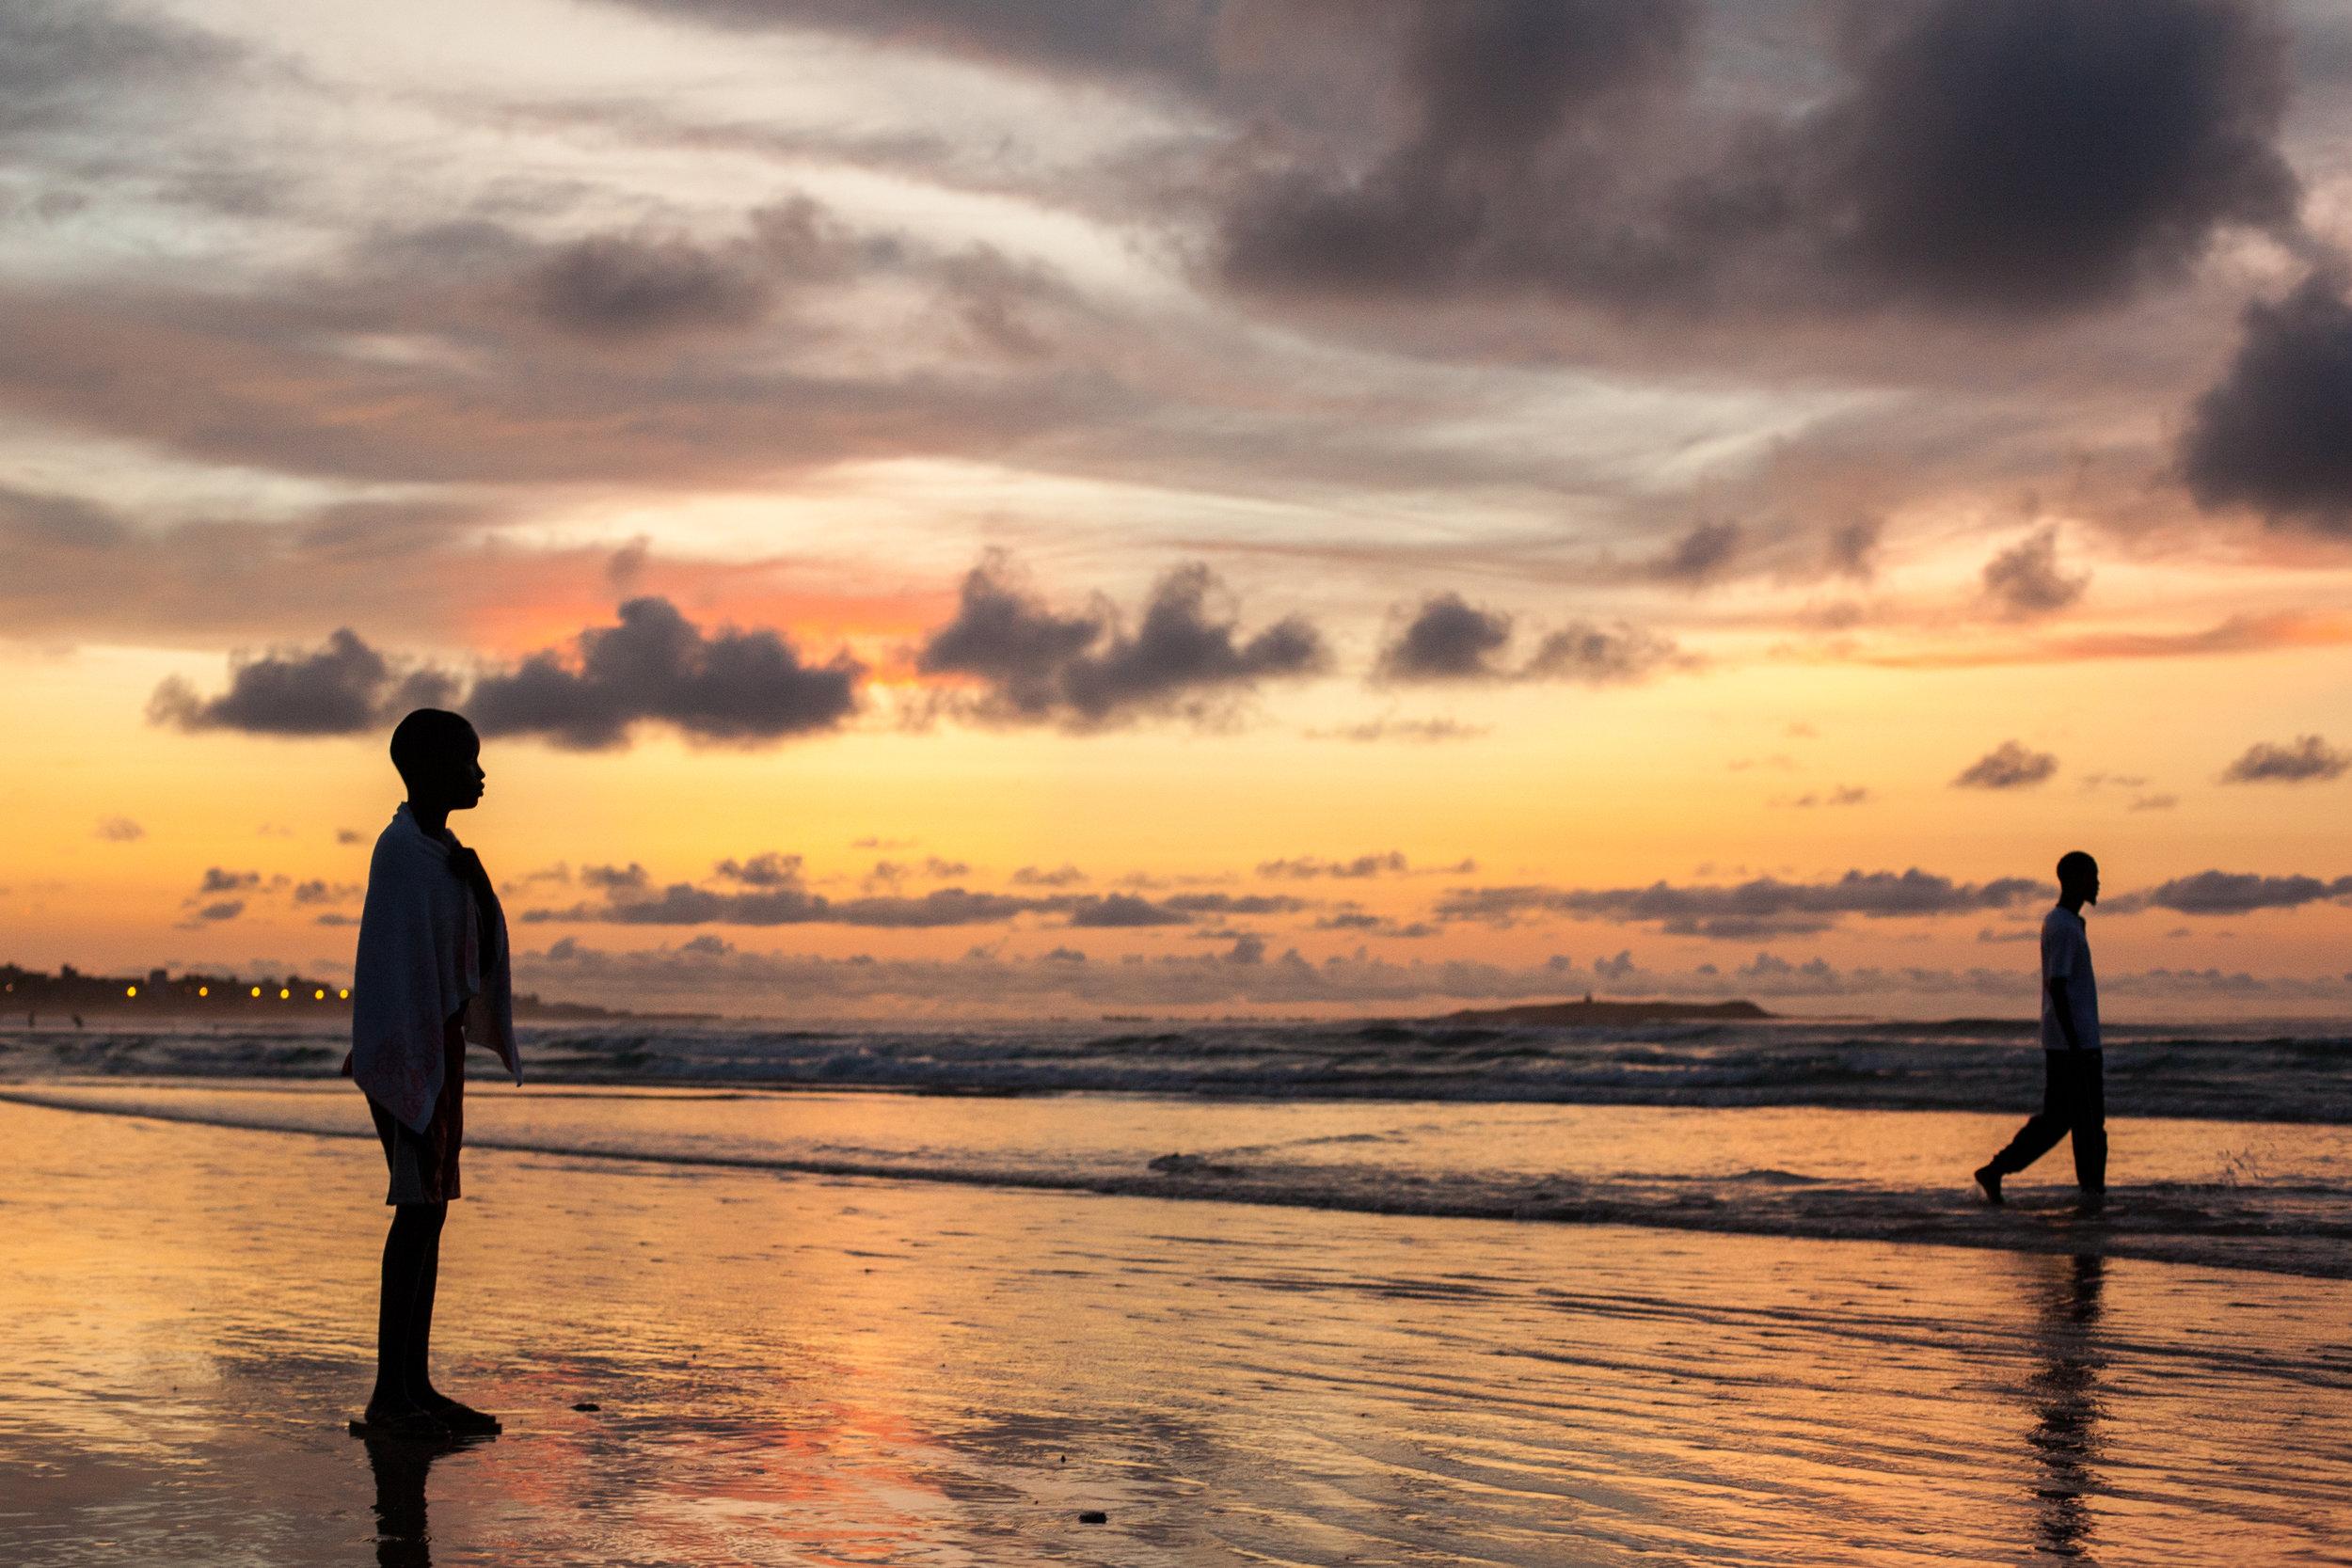 Silhouette photo in Senegal